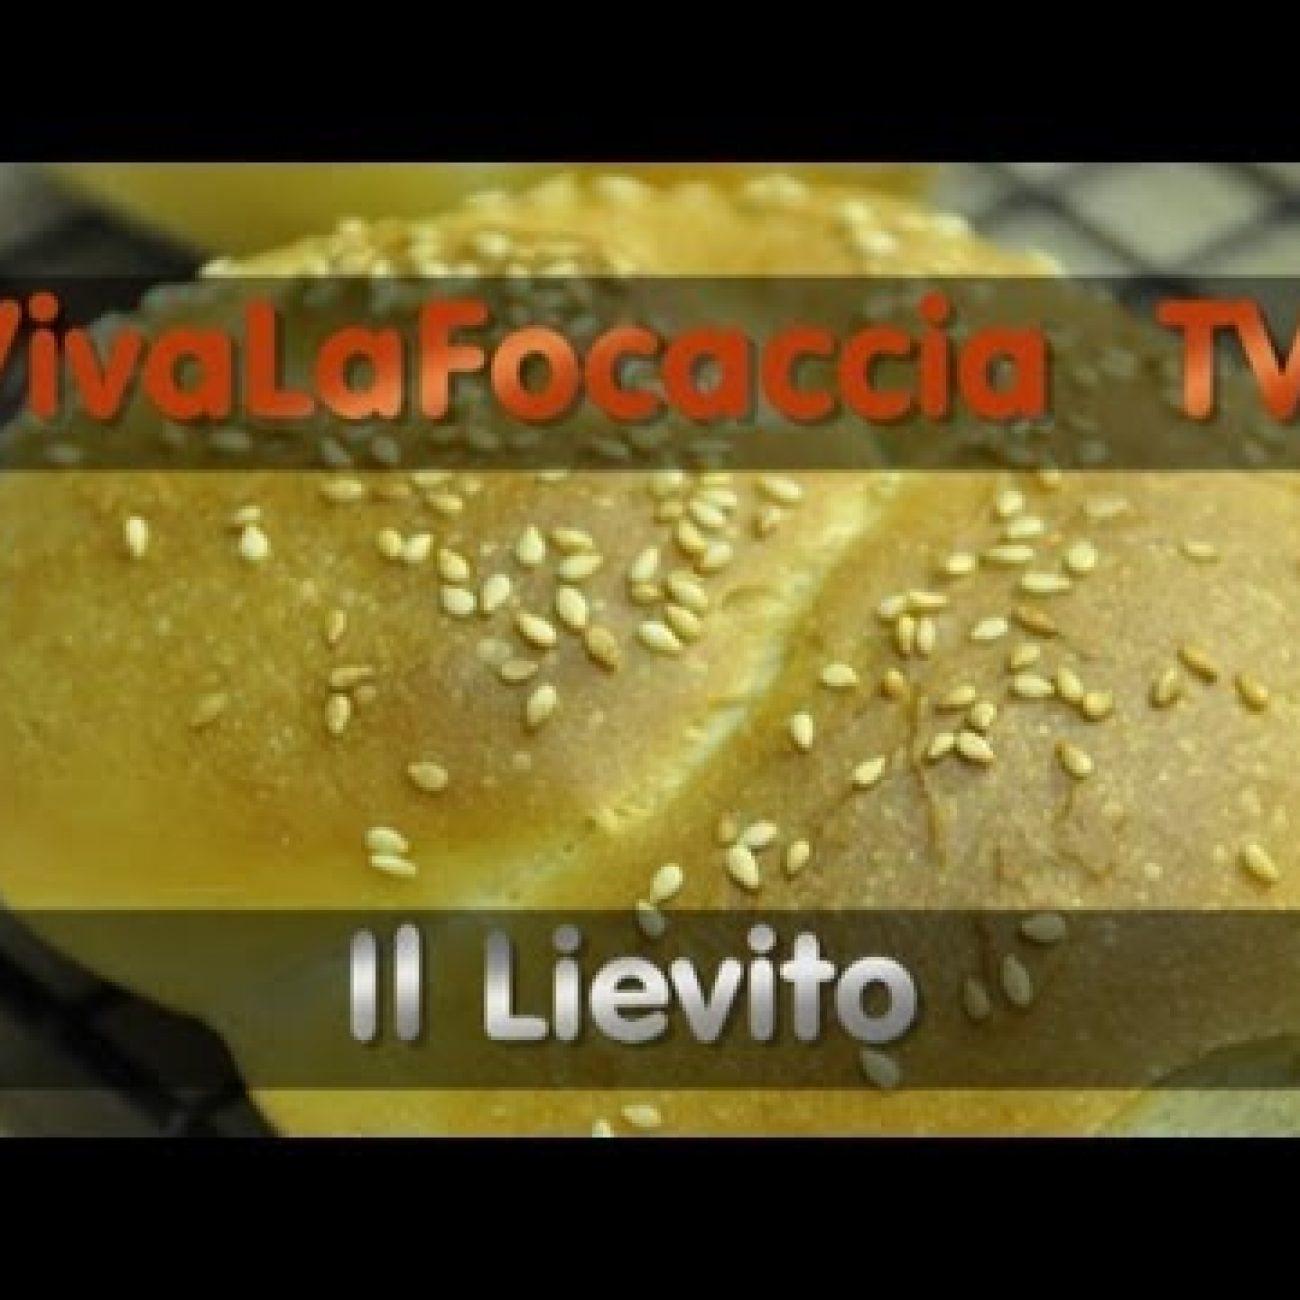 VivaLaFocaccia TV – Puntata 6 – Il Lievito